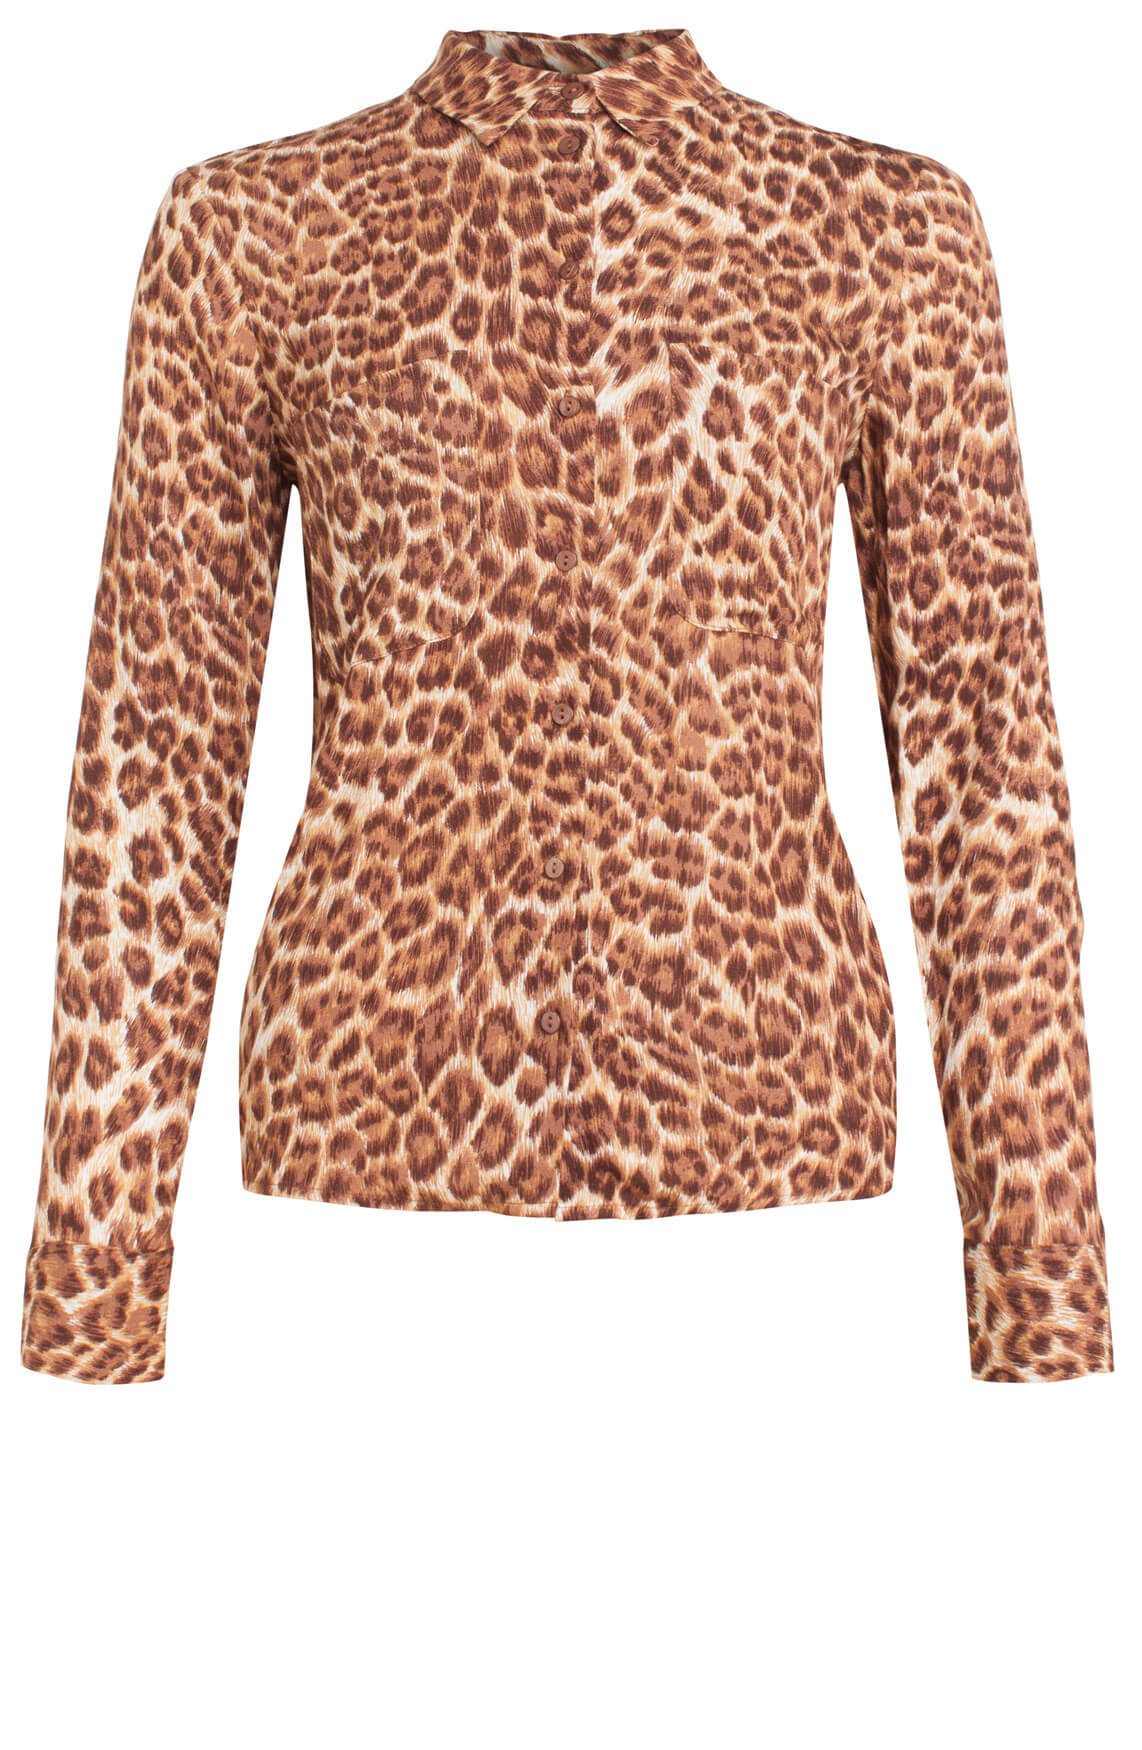 Samsoe Samsoe Dames Milly panterprint blouse Bruin